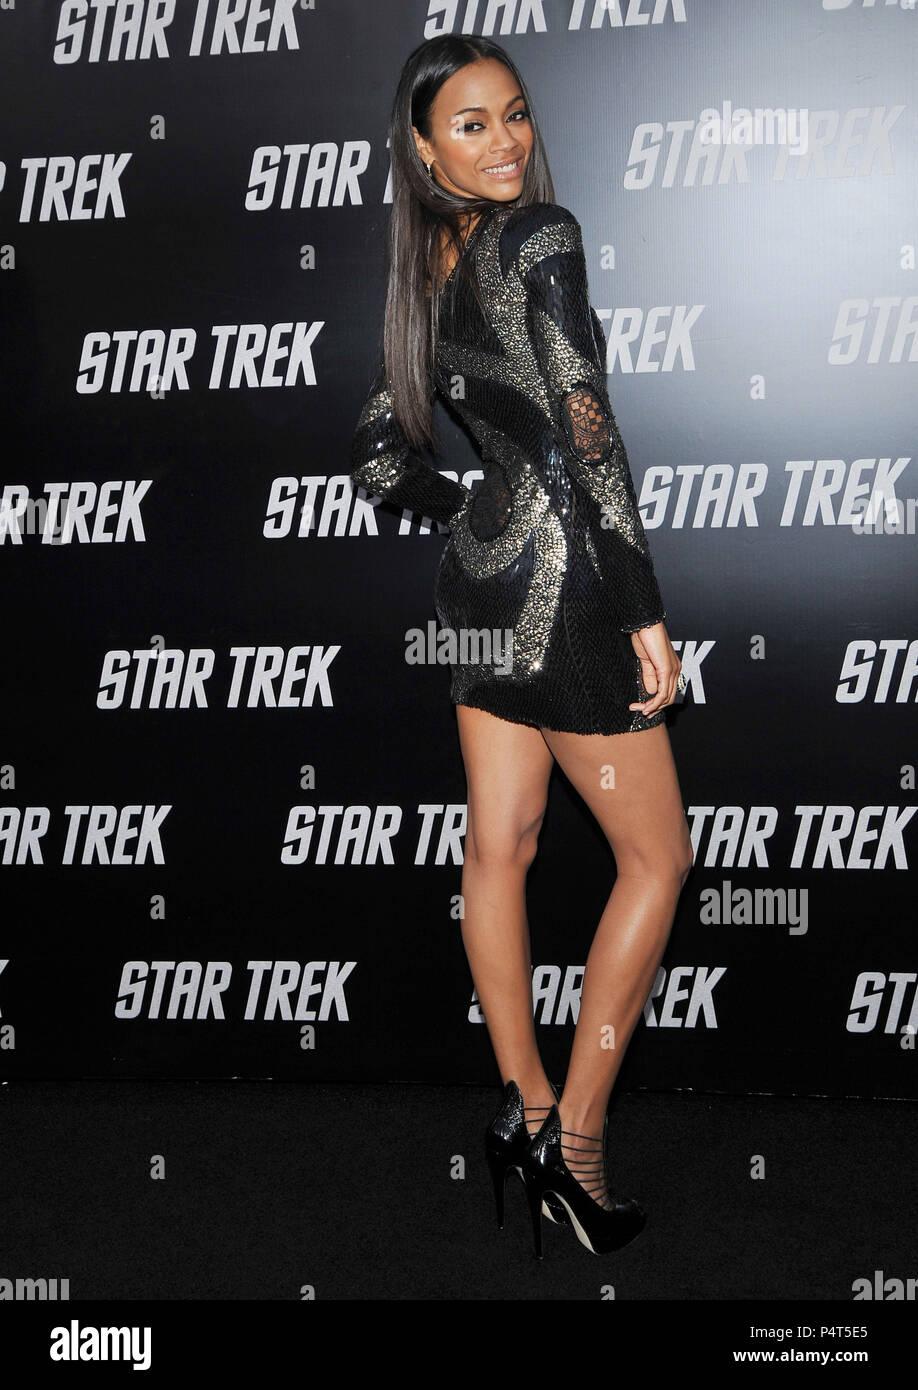 Zoe Saldana Star Trek Los Angeles Premiere At The Chinese